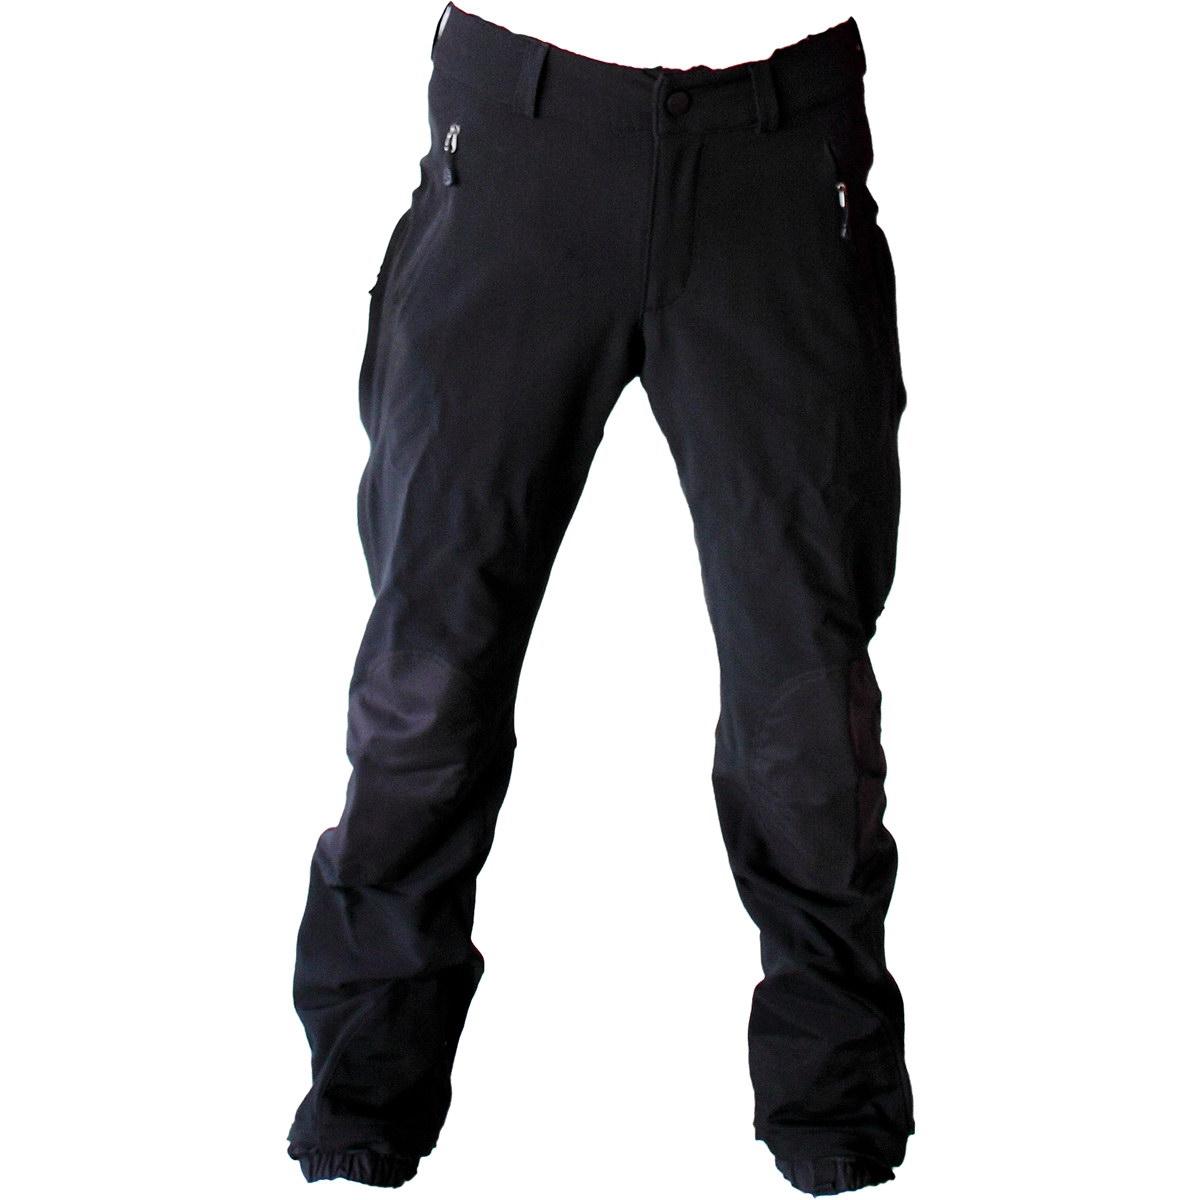 Patagonia  Sonderangebote –  Women's Backcountry Guide Pants – Softshellhose nun mit 40  % Rabatt für 113.90 € im Angebot